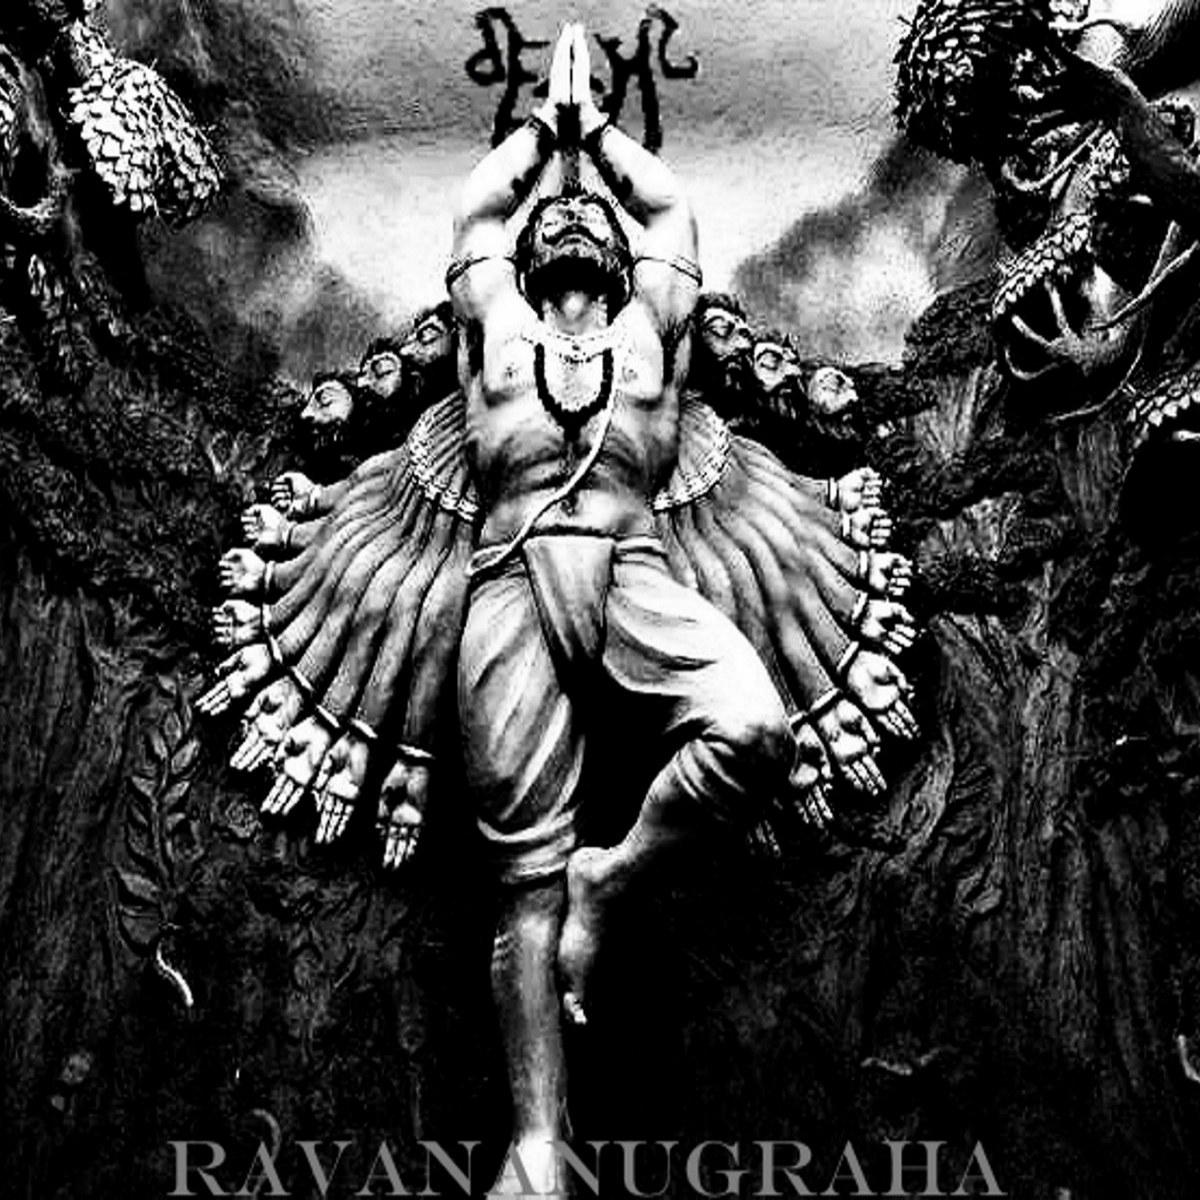 Reviews for Evanoth - Ravananugraha